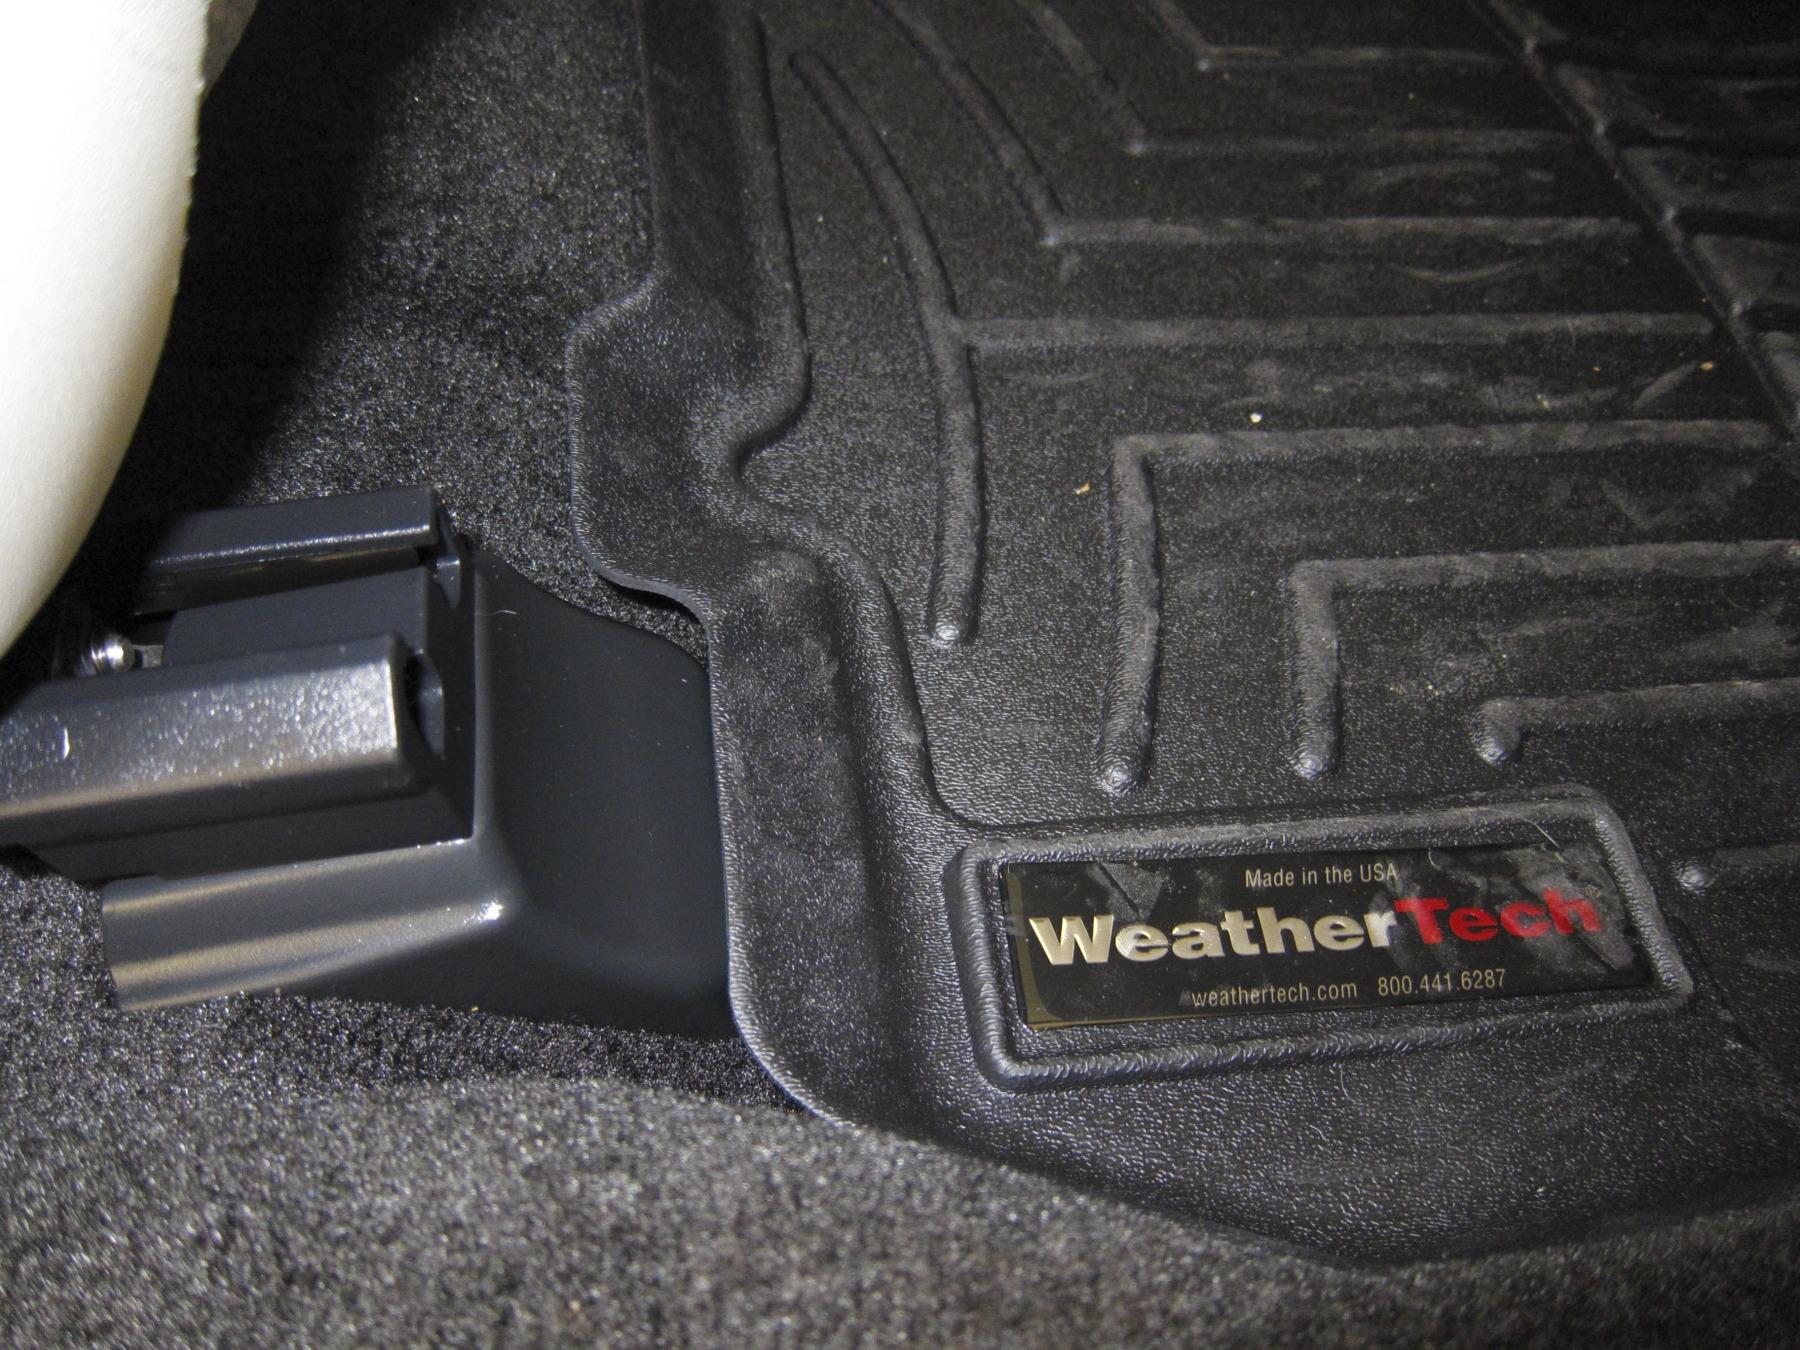 2012 Outback Weathertech Floor Mats Help Subaru Outback